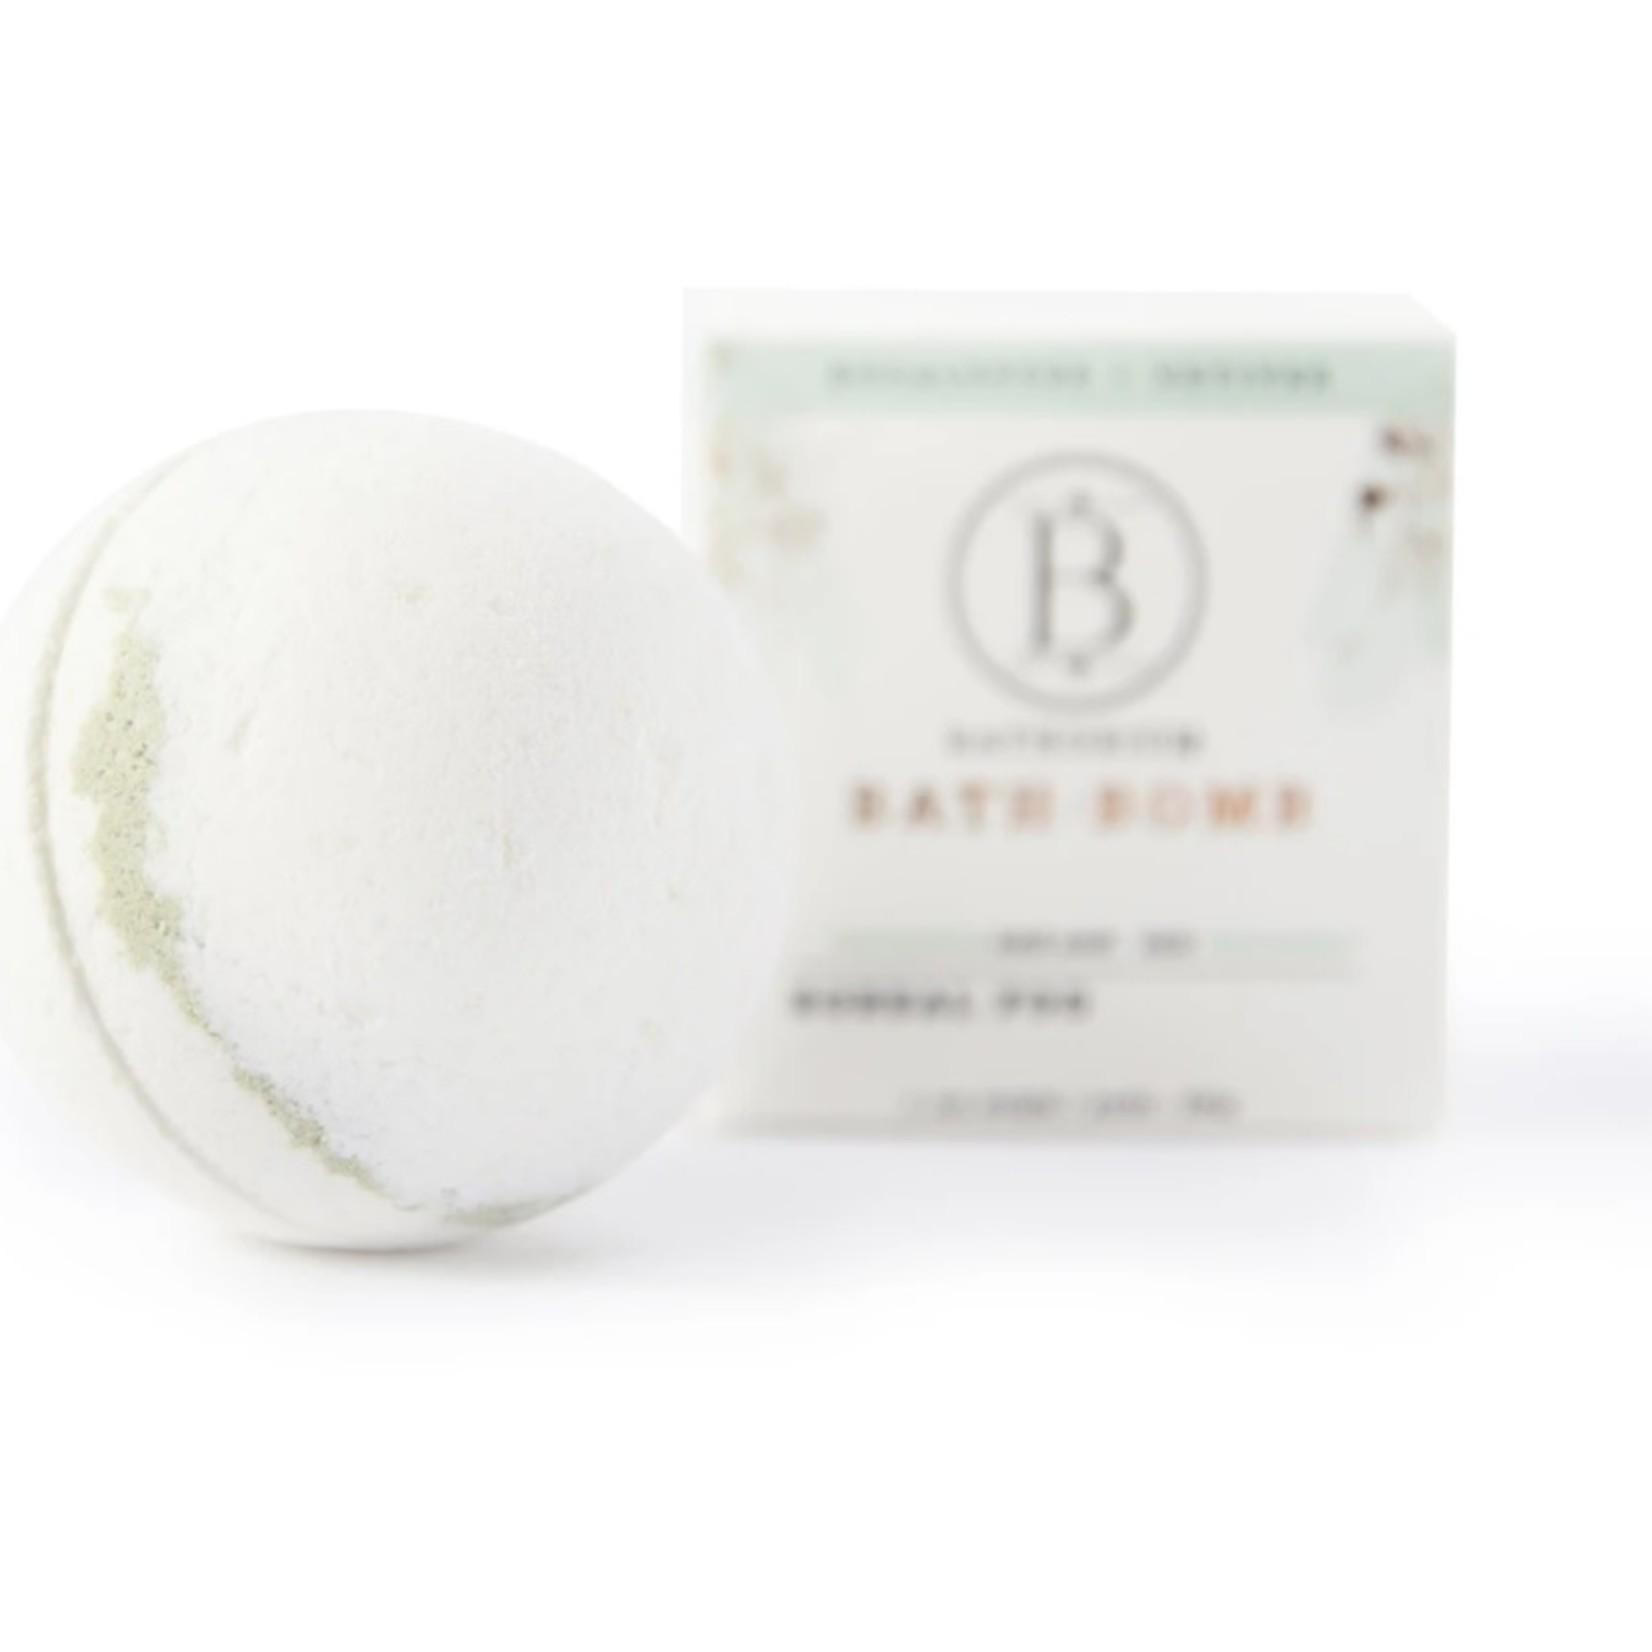 Bath Bomb Boreal Fog